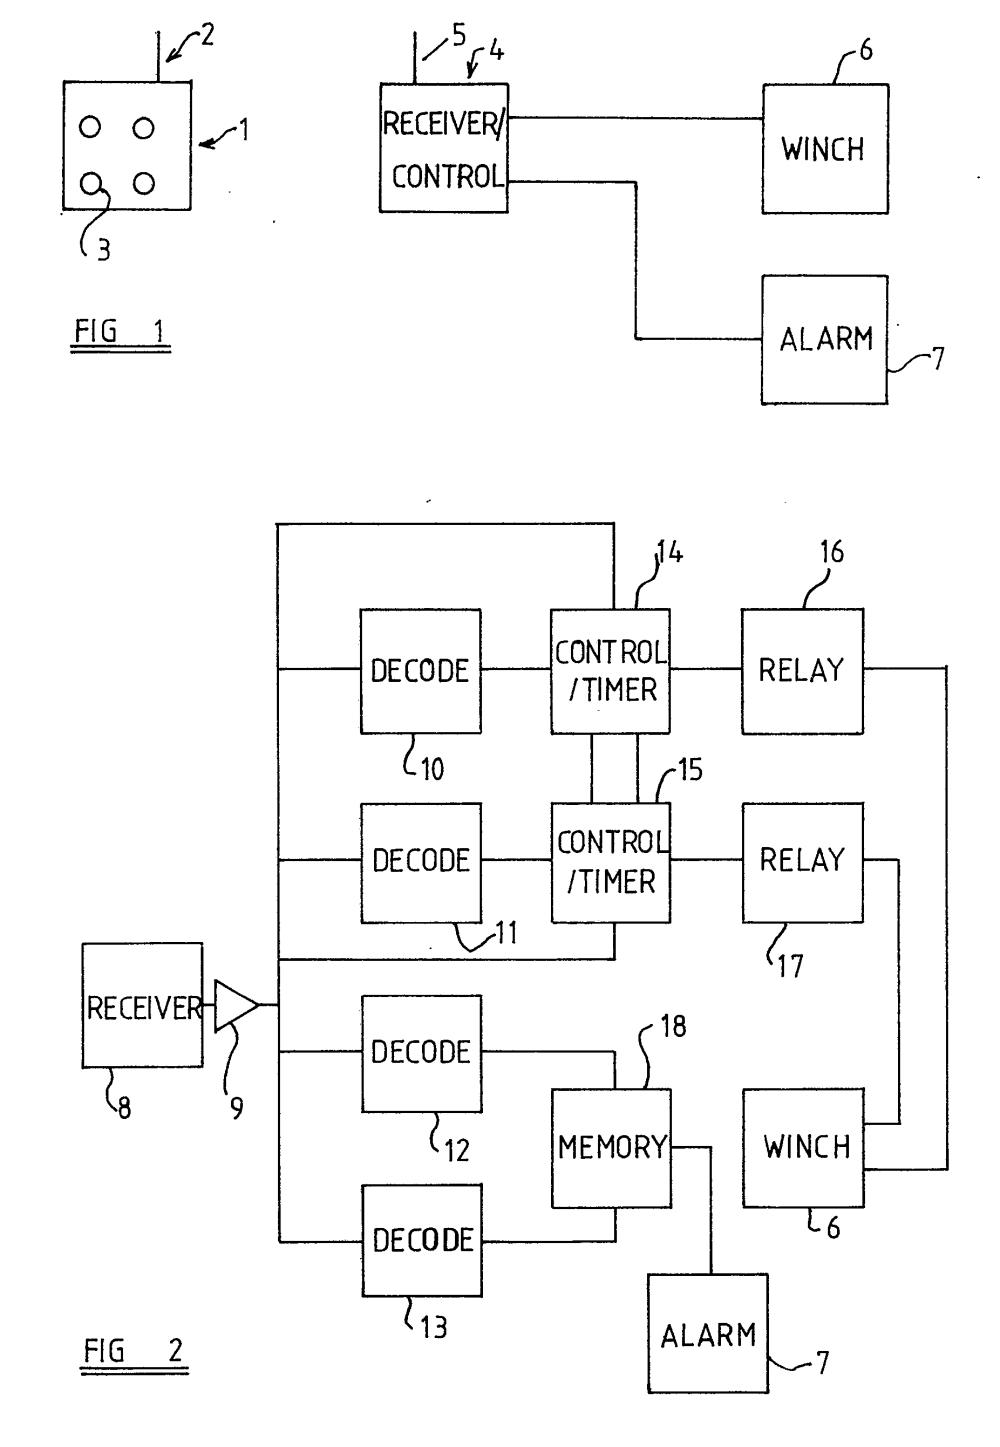 Ge Rr7 Low Voltage Relay Wiring Diagram - low voltage wire ... Ge Rr Wiring Diagram on